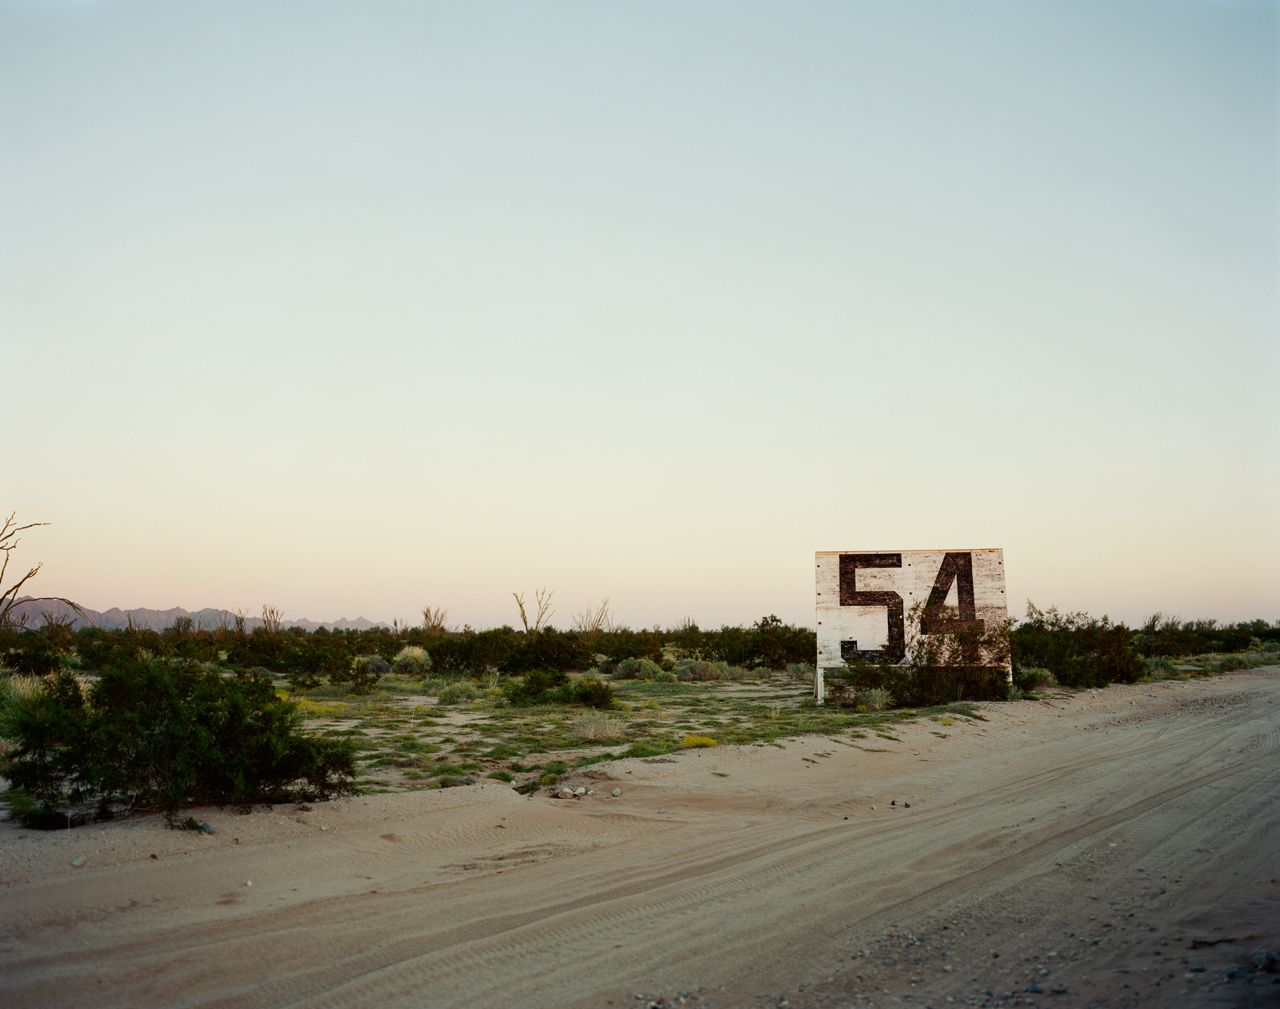 Area 54, Barry M. Goldwater Range West, Arizona